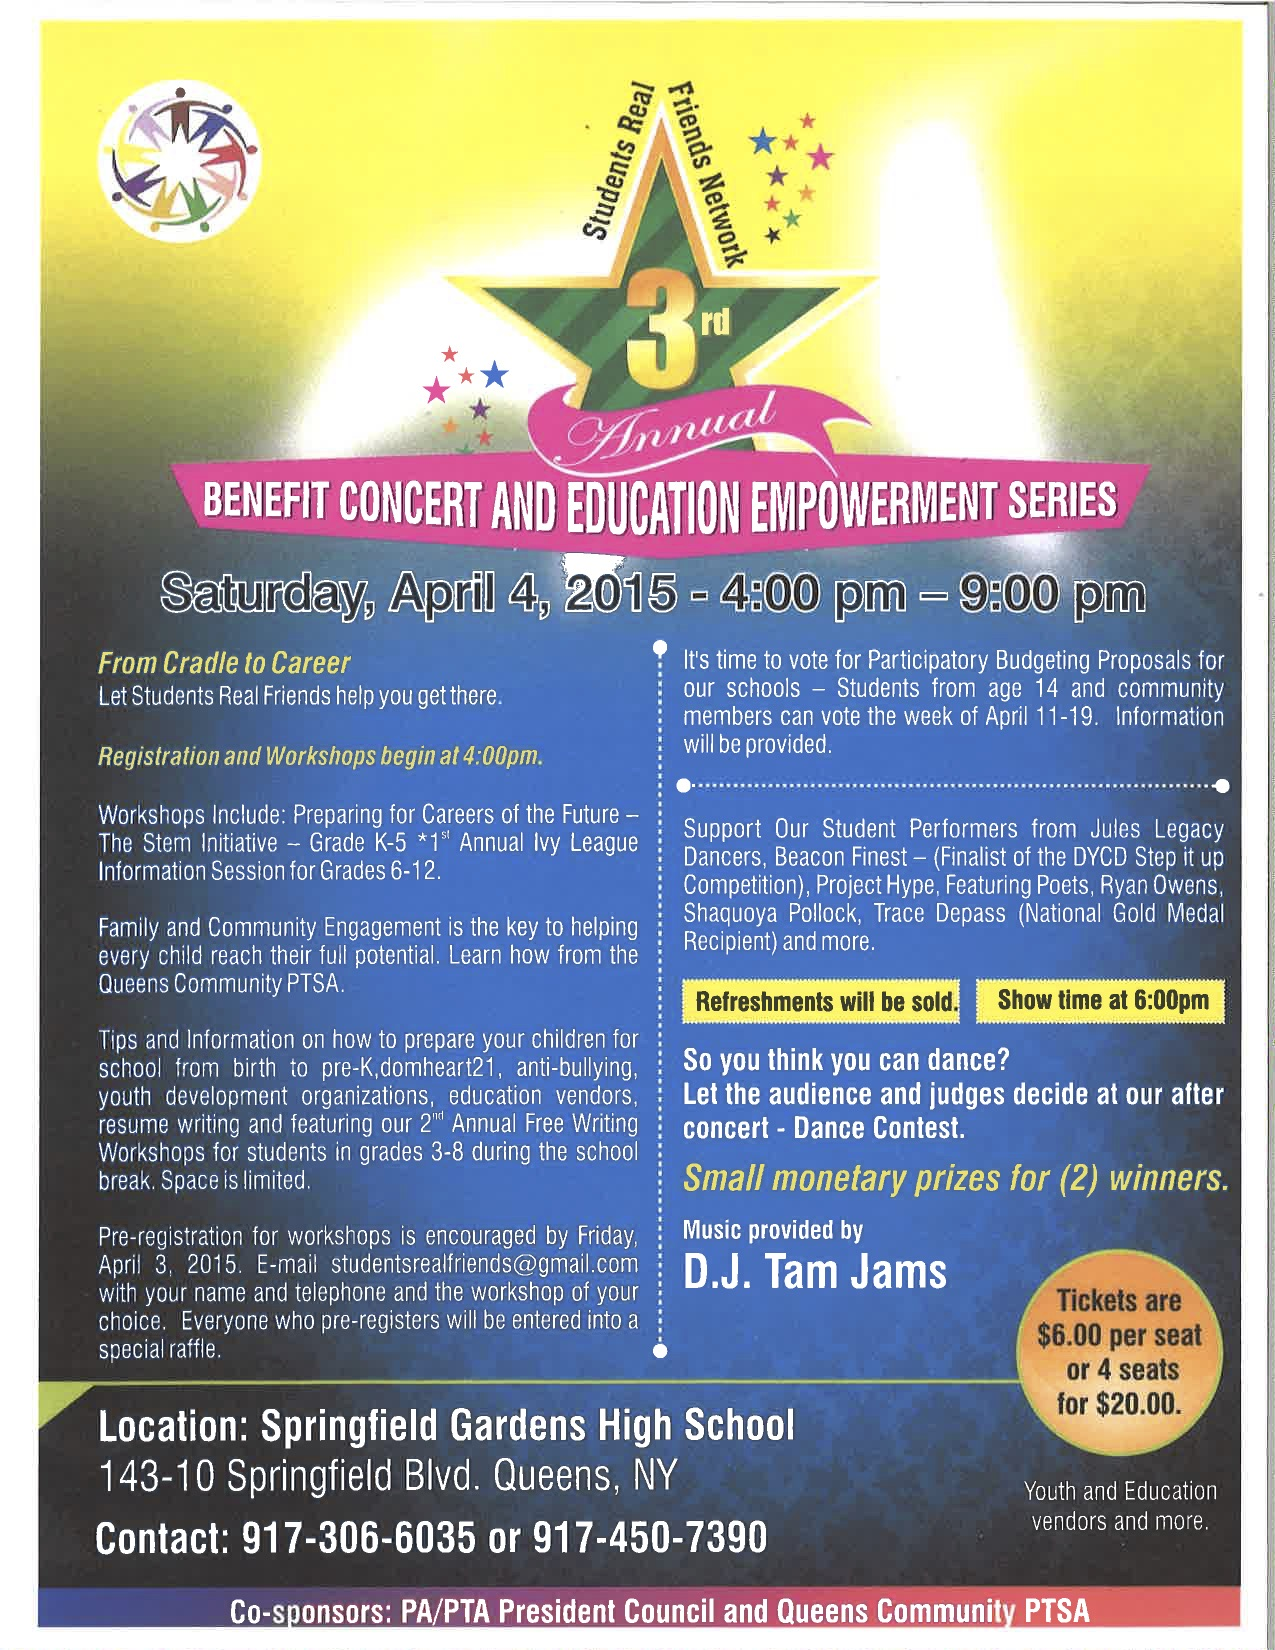 Srfn 3rd Annual Benefit Concert Education Empowerment Series Jamaica 311